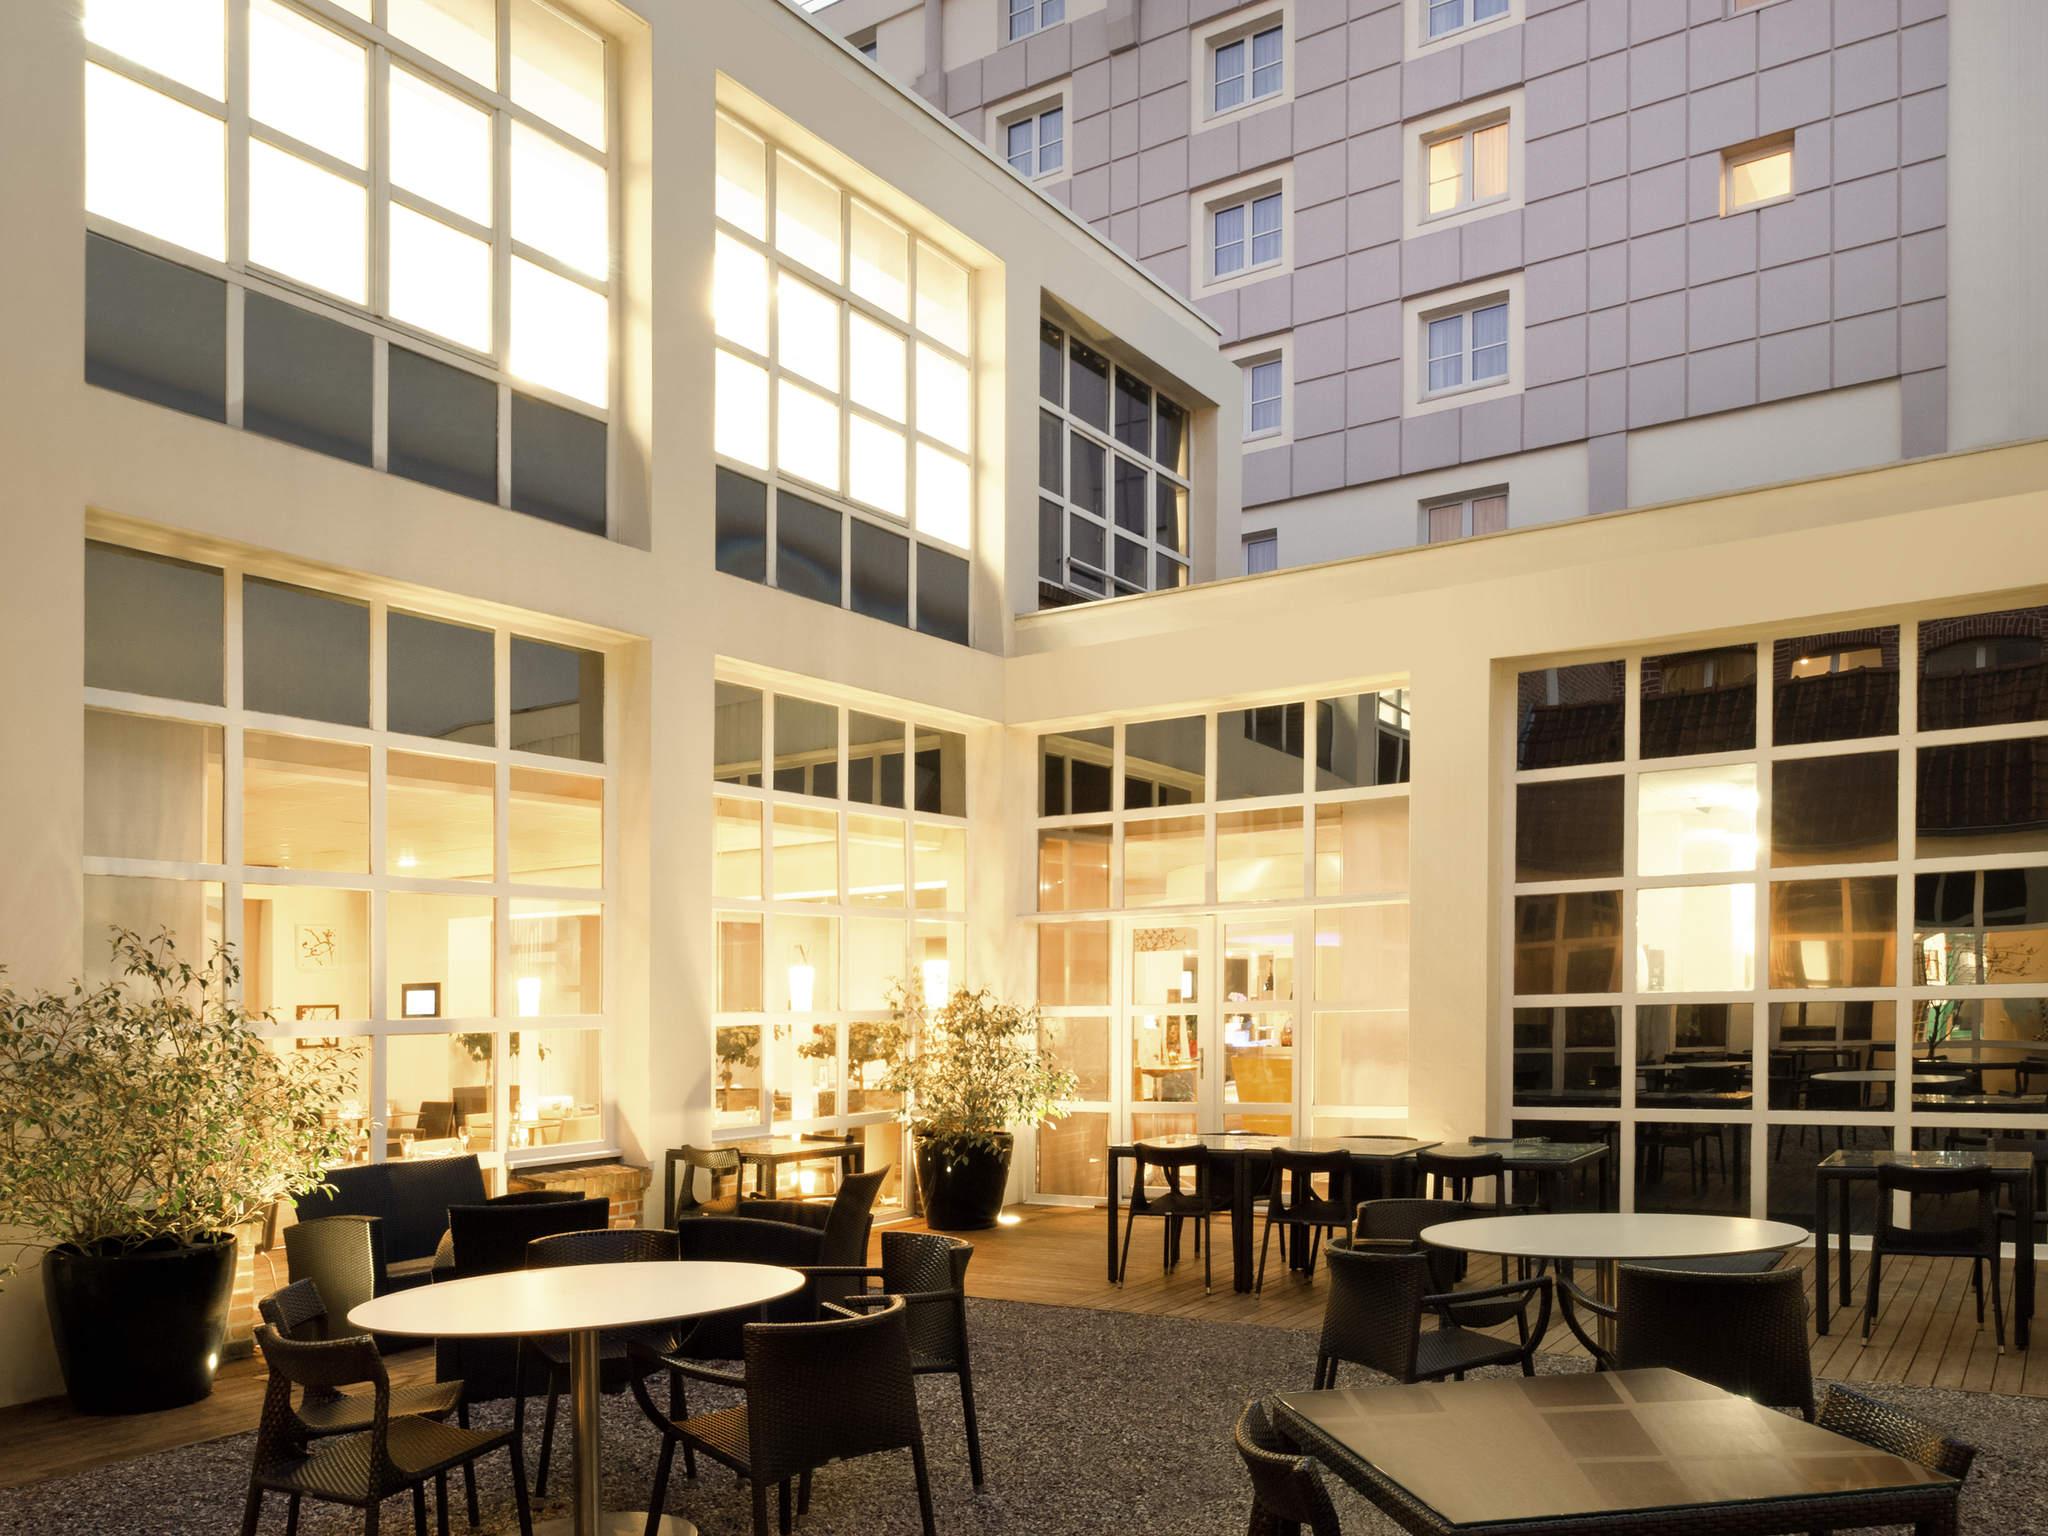 Hotel - Novotel Lille Centre Grand-Place